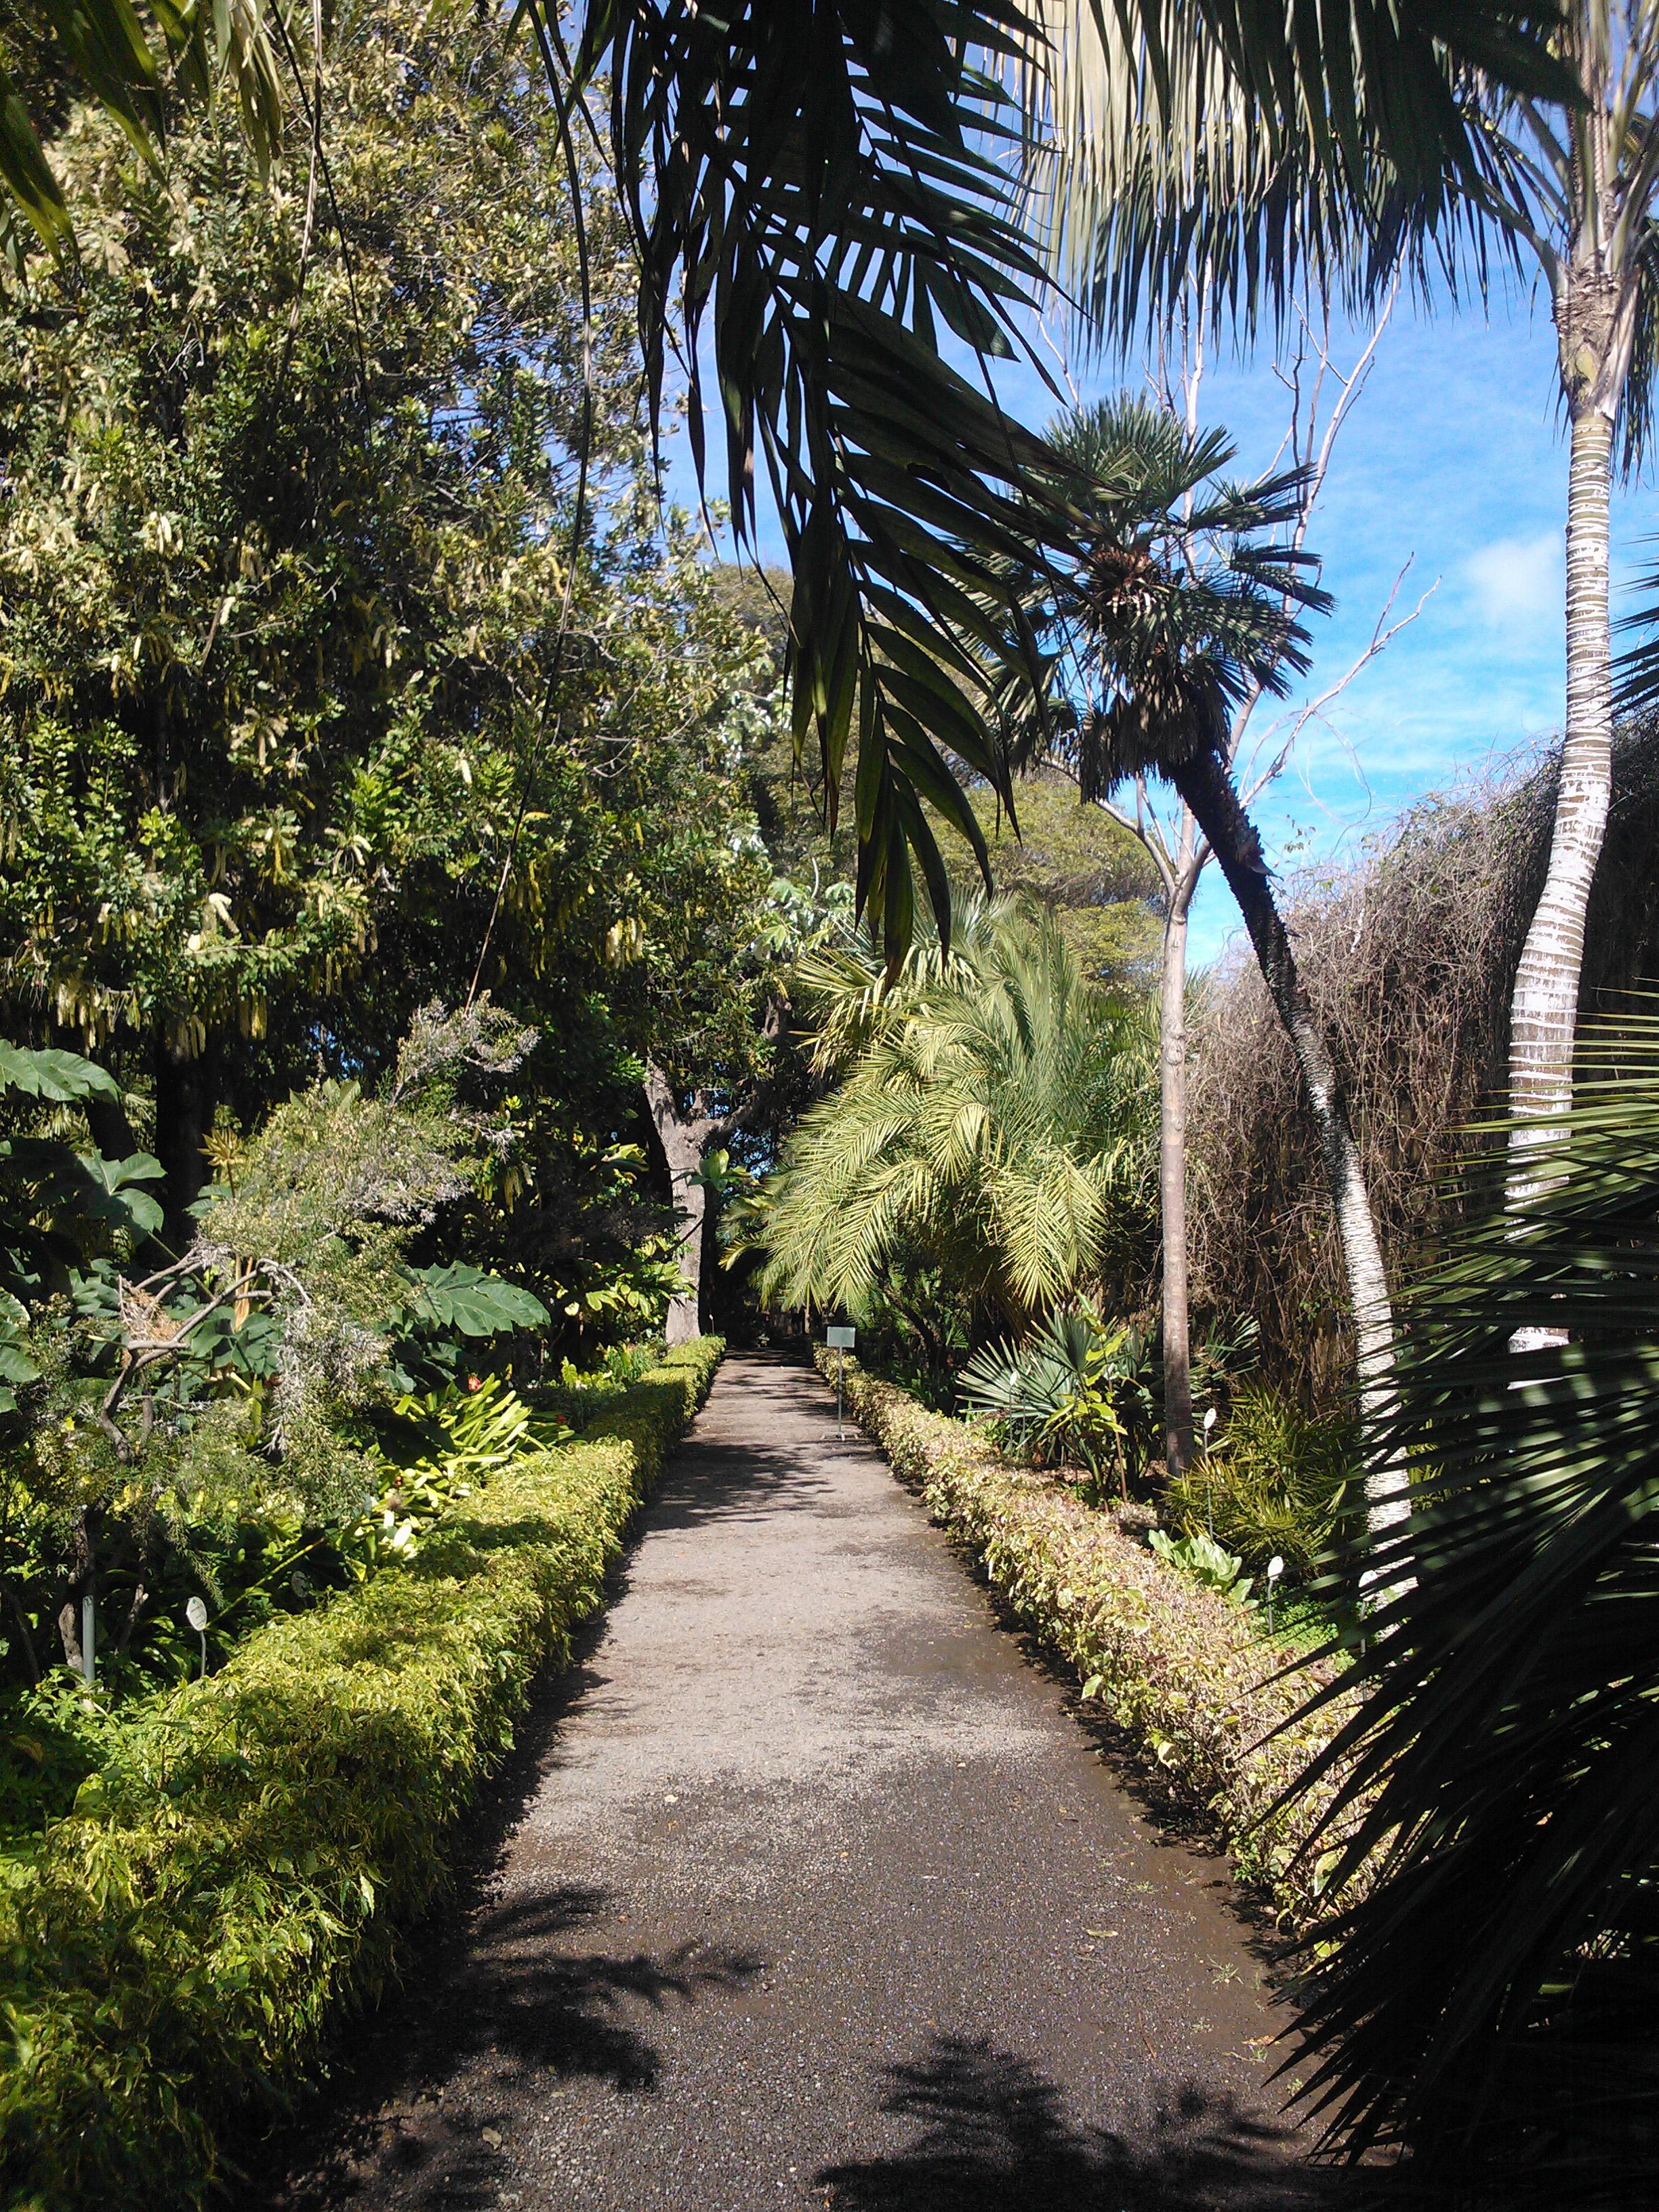 Botanical garden puerto de la cruz - Botanical garden puerto de la cruz ...